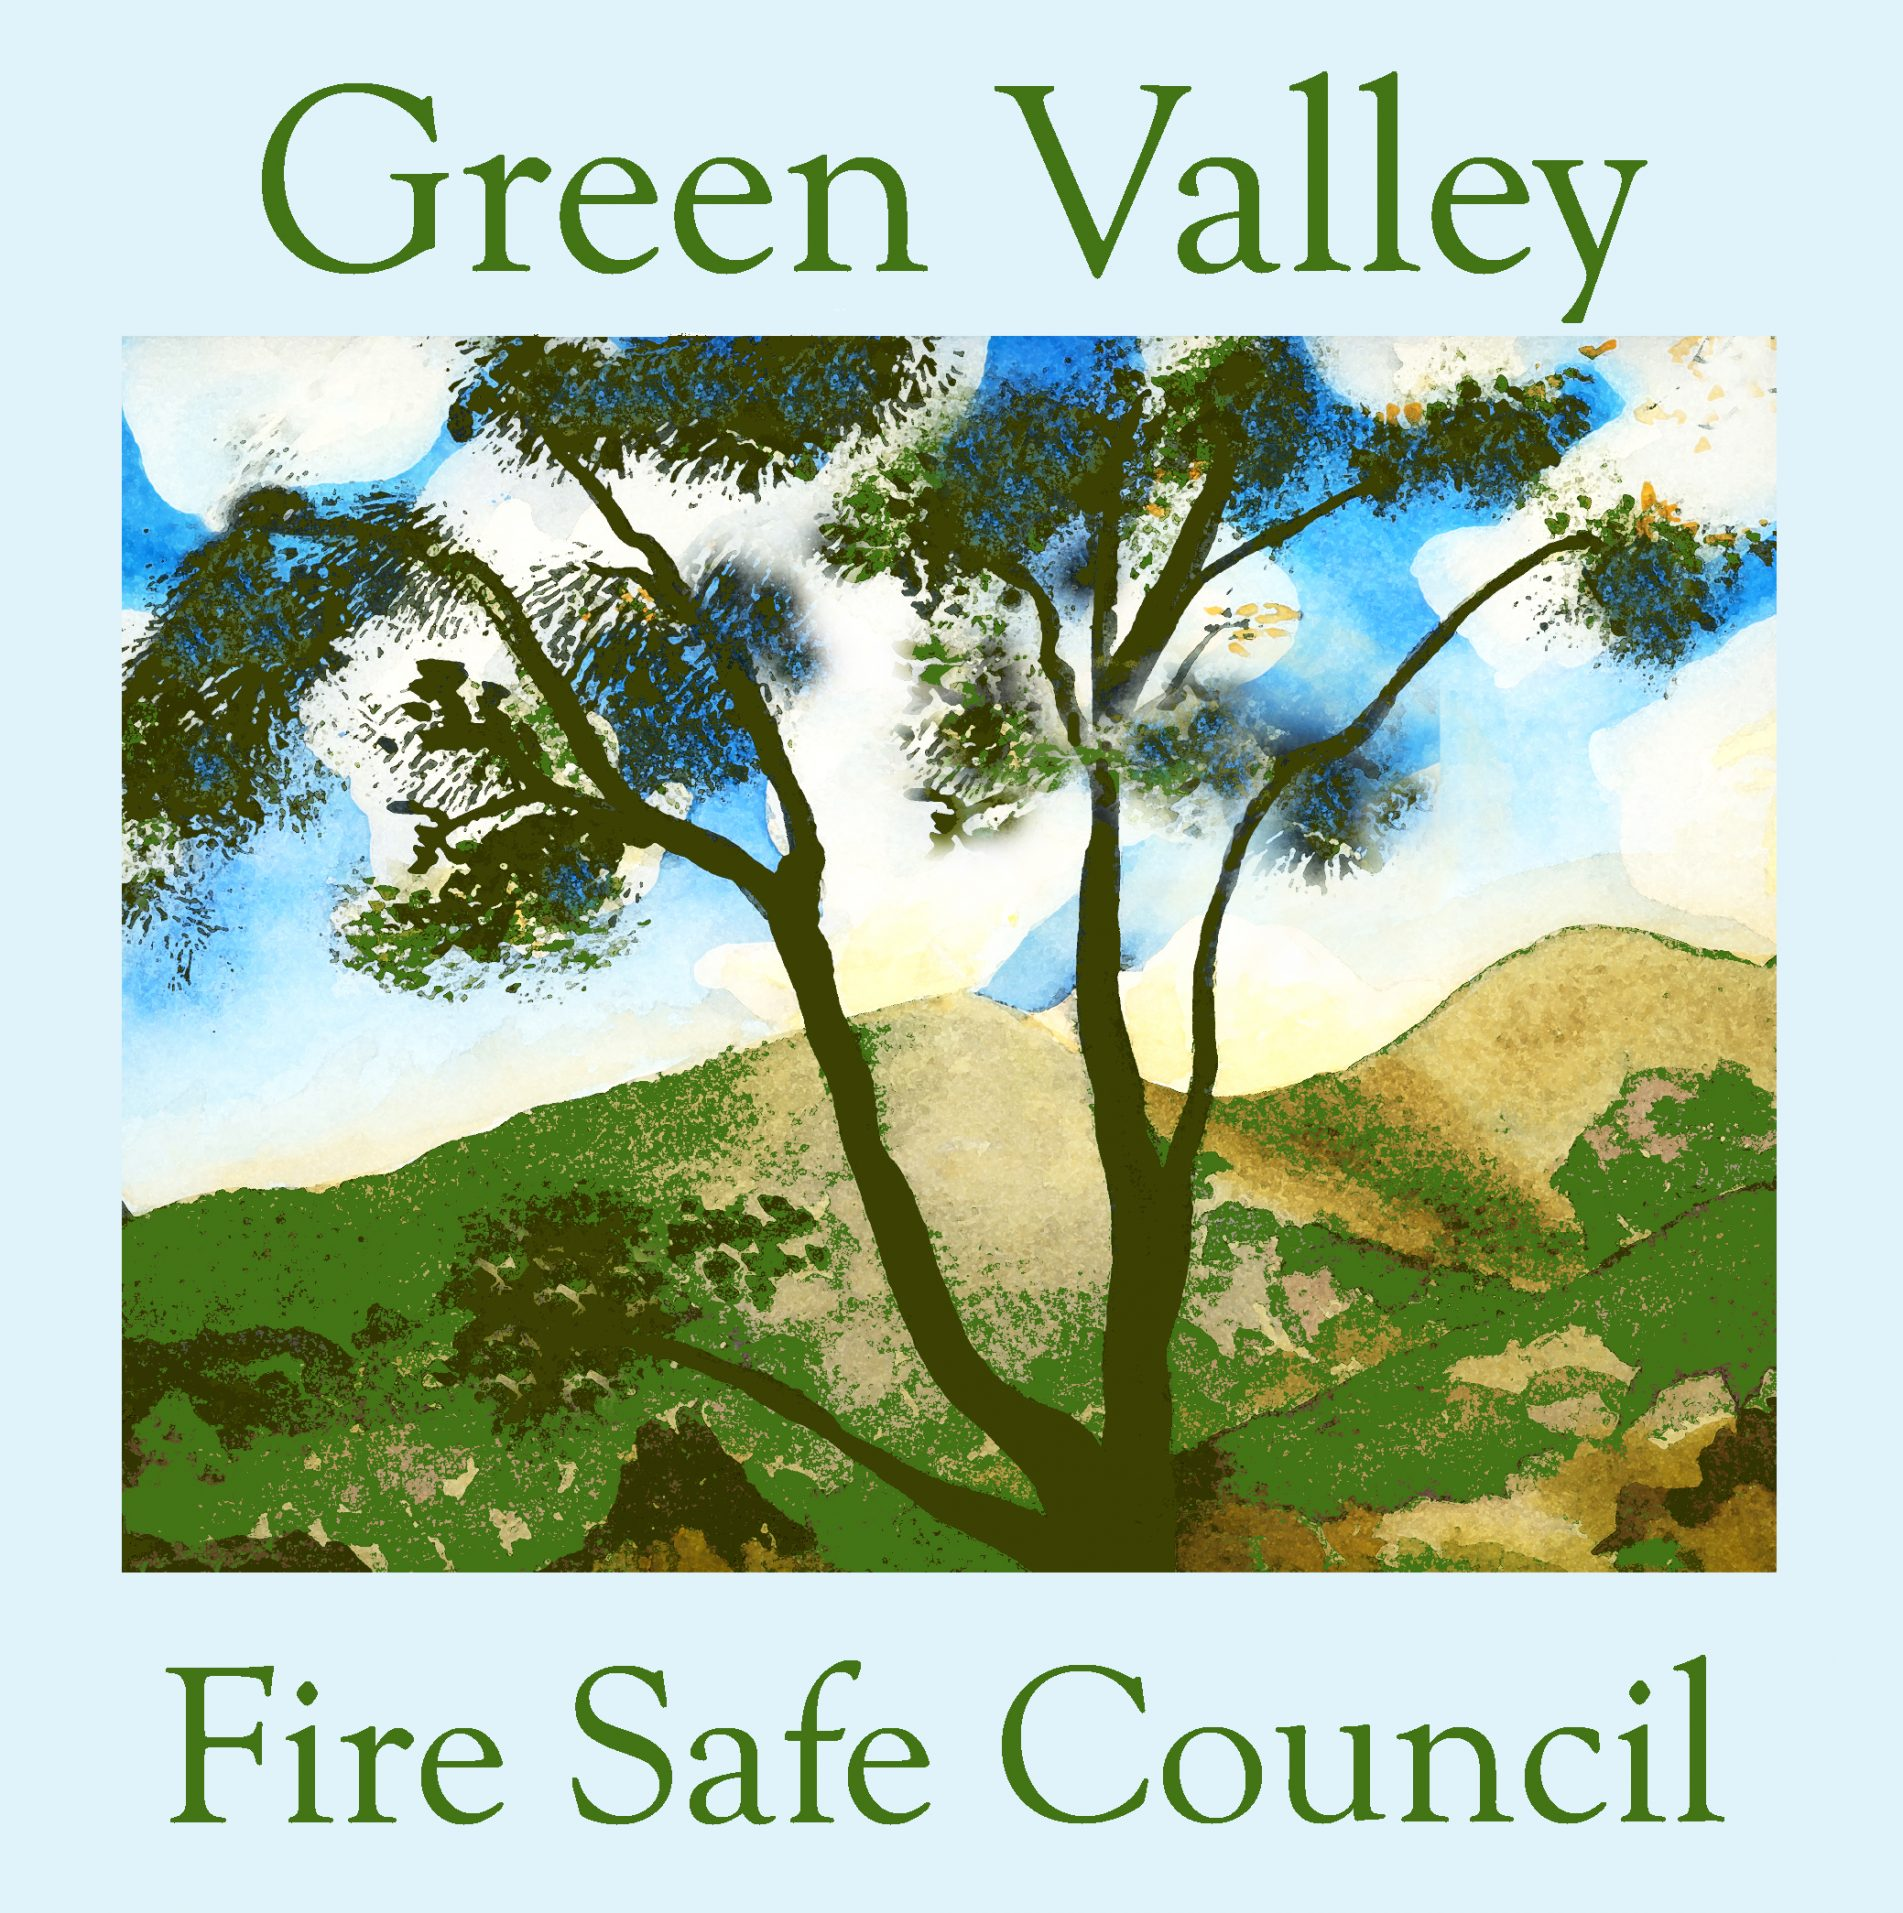 Green Valley Fire Safe Council